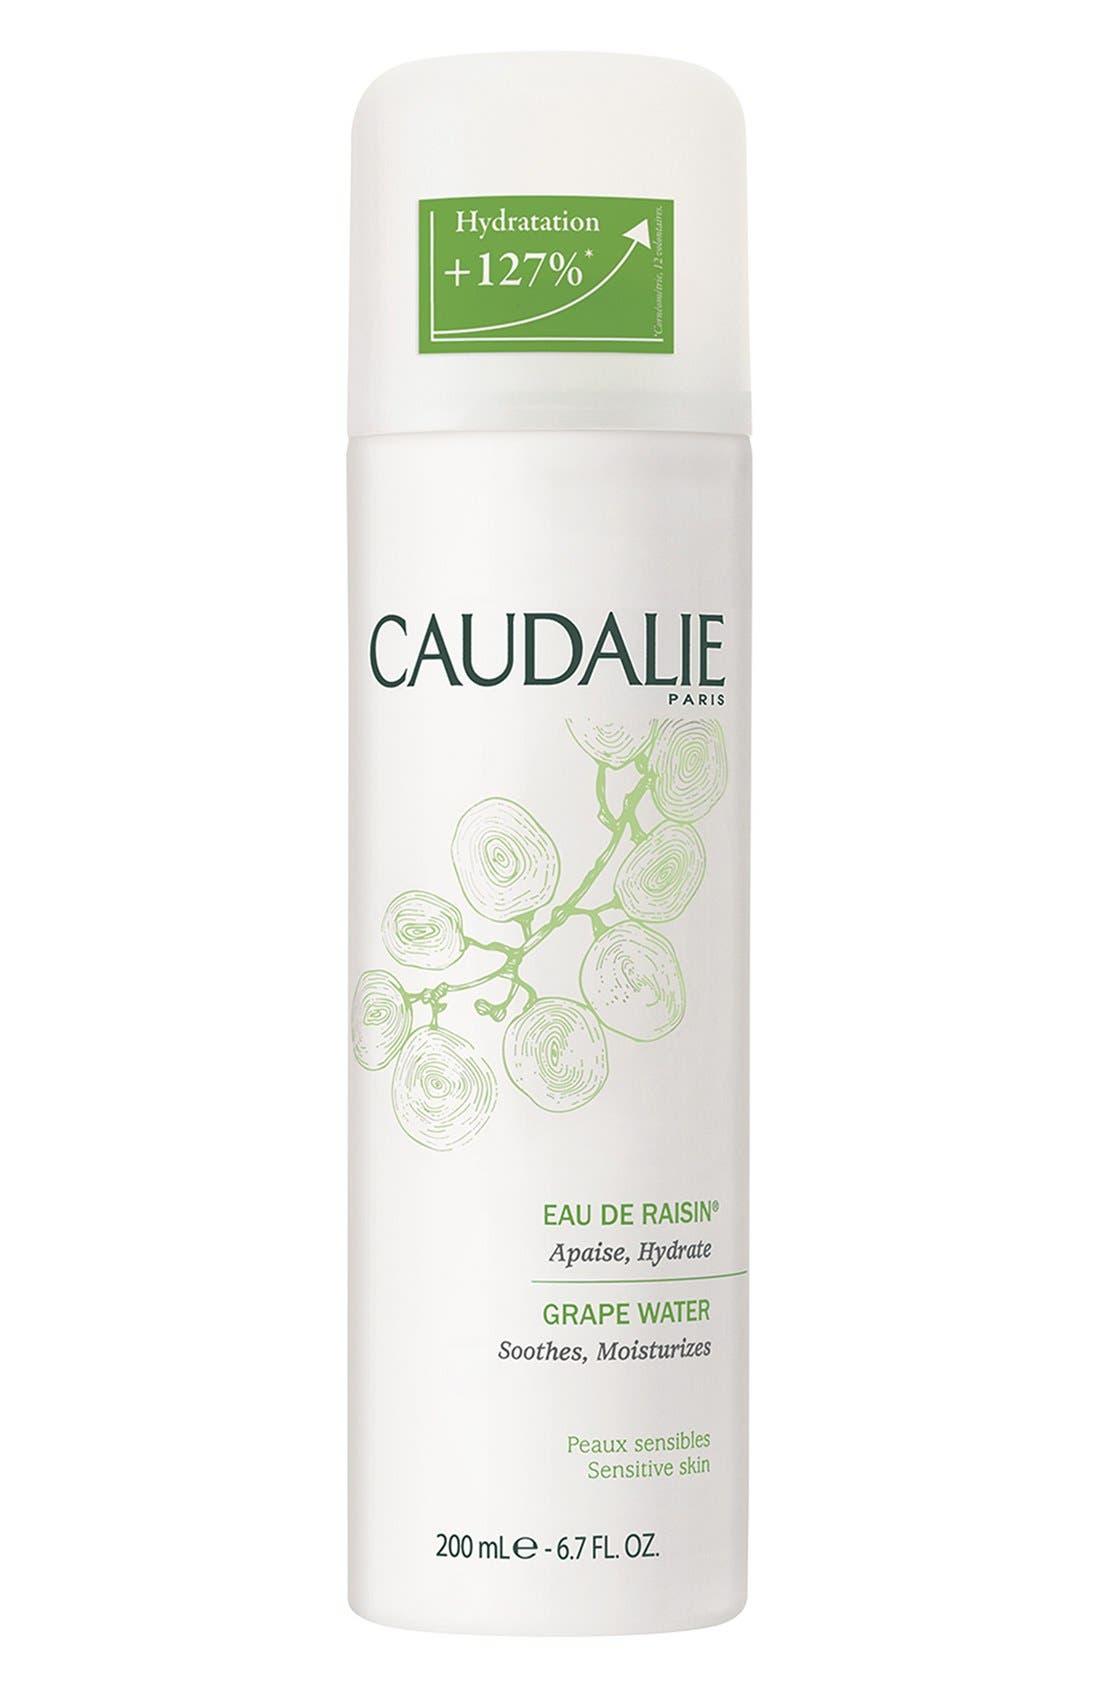 CAUDALÍE Grape Water Harvest